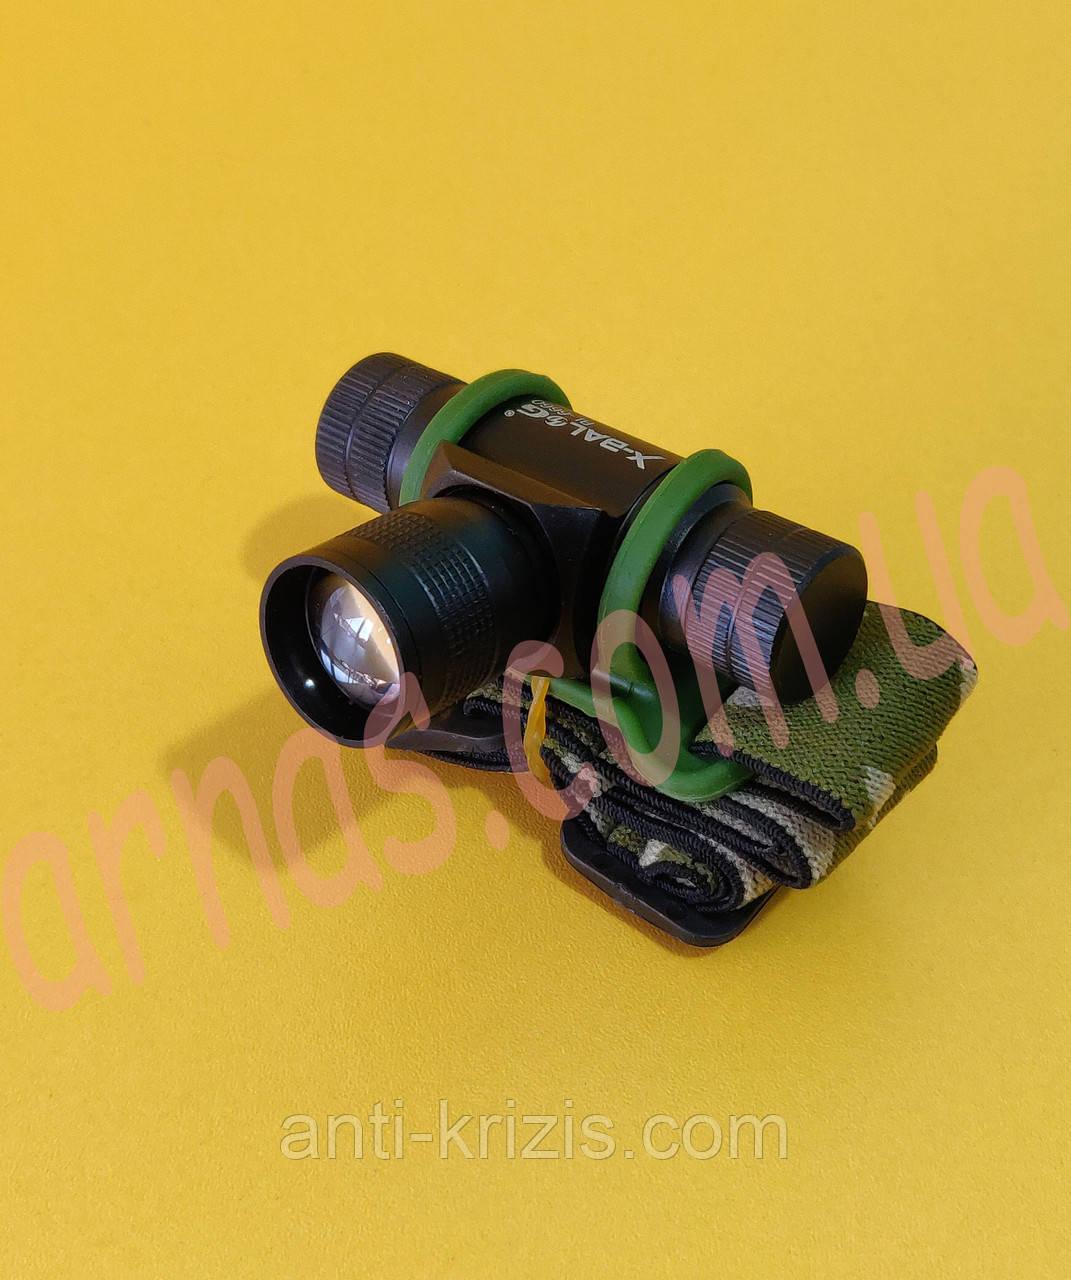 Налобний ліхтар акумуляторний Bailong BL-6660